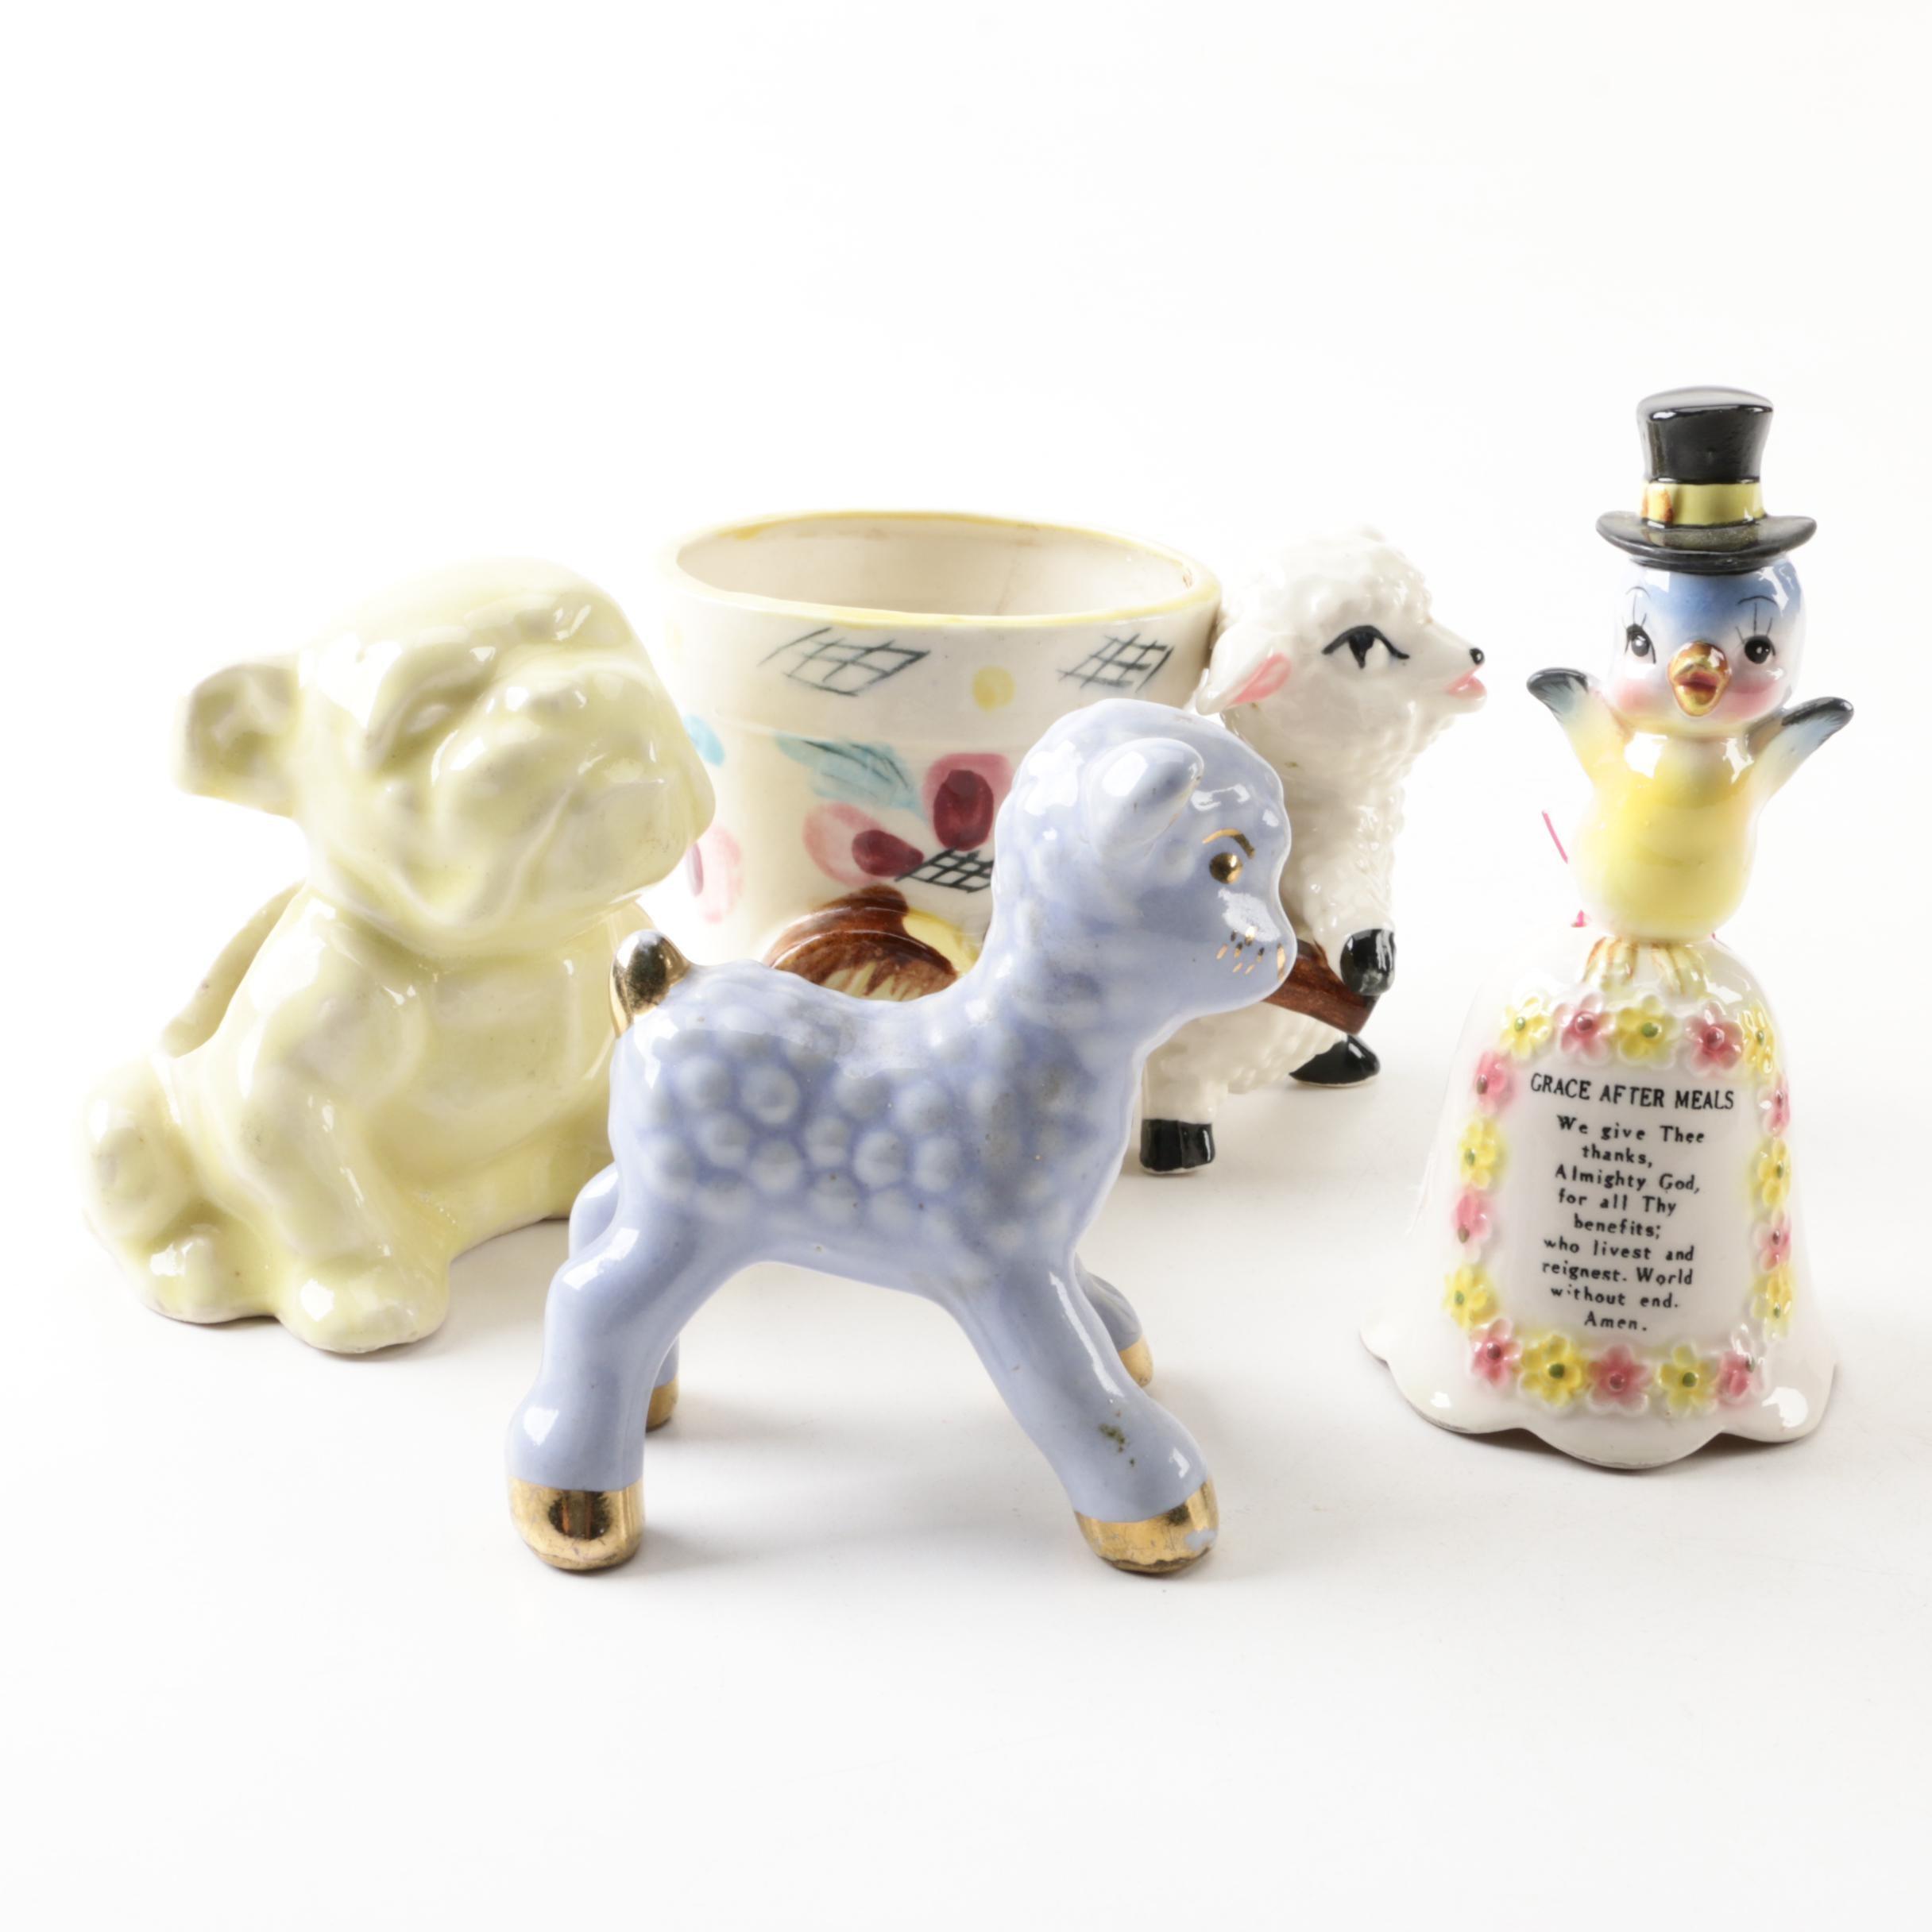 Vintage Ceramic and Bone China Décor Including Grantcrest